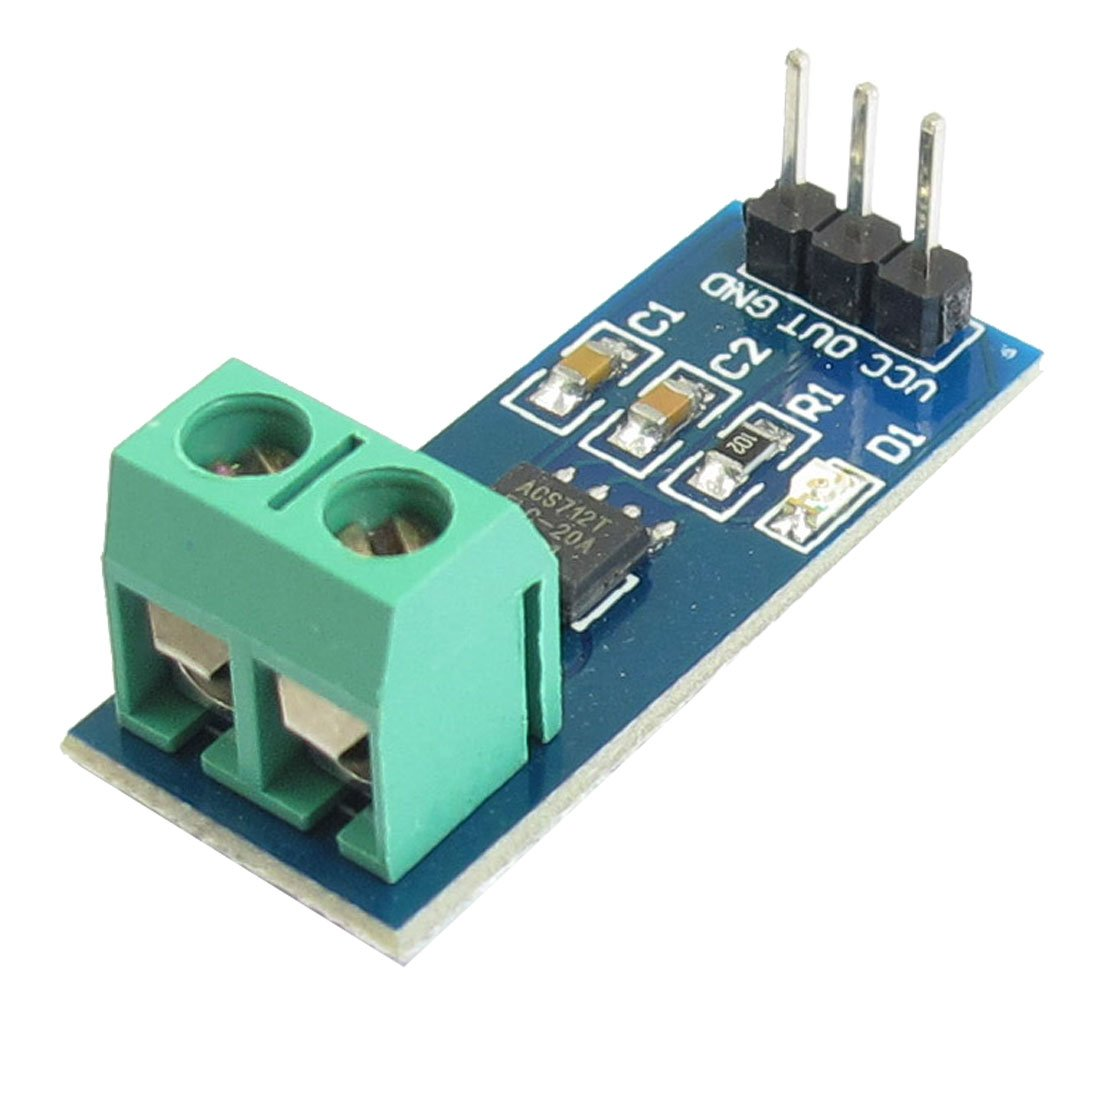 Current Sensing Probe : Acs current sensor module detector amps amperage